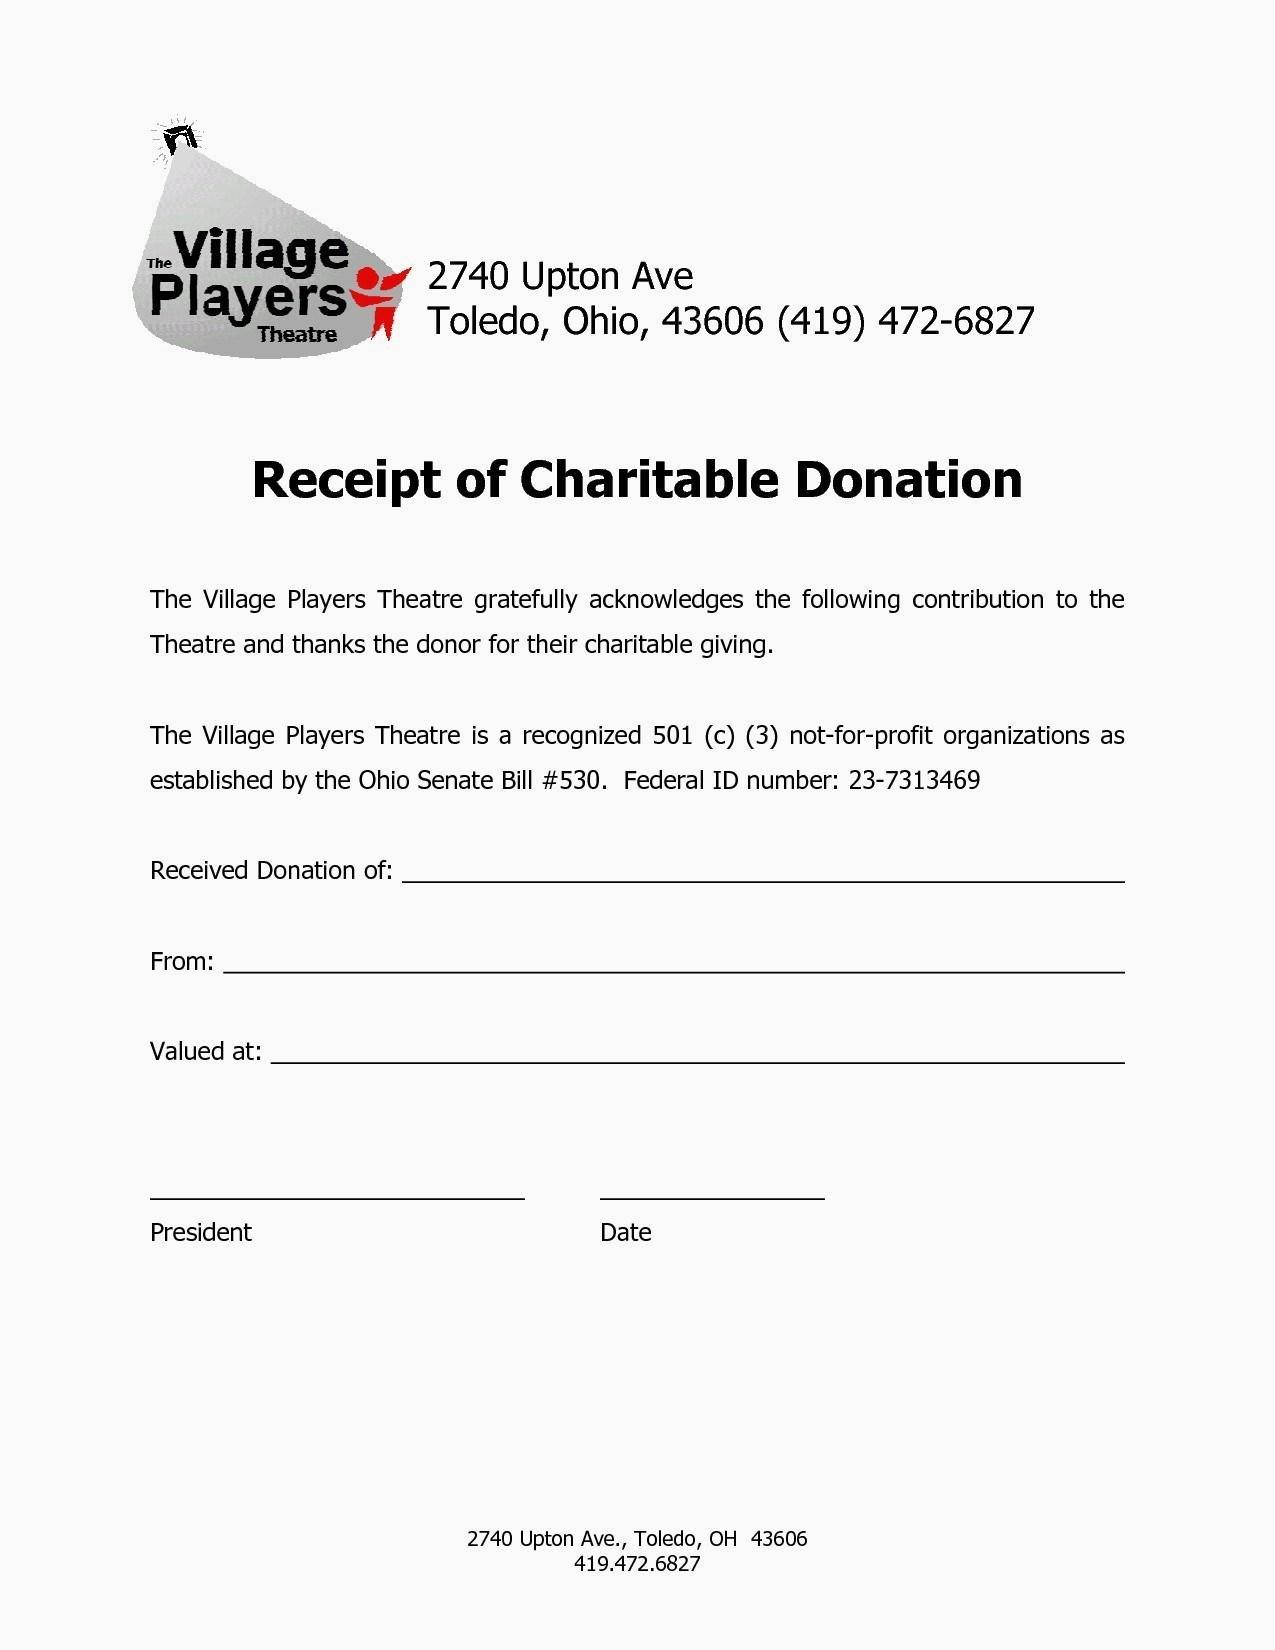 Charitable Contribution Receipt Form